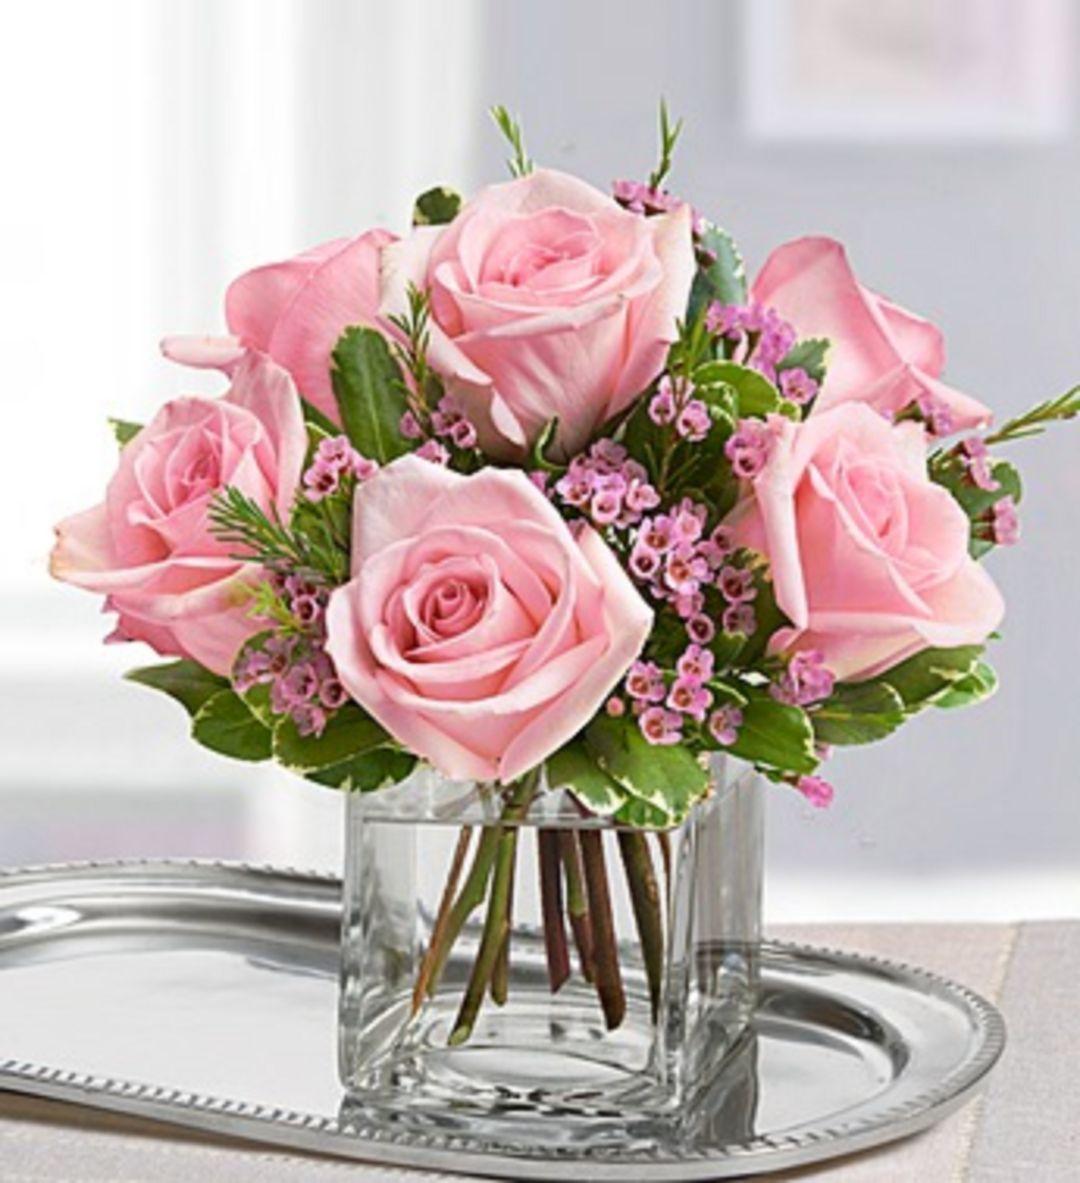 Top 15 Flower Arrangements Collections Ideas